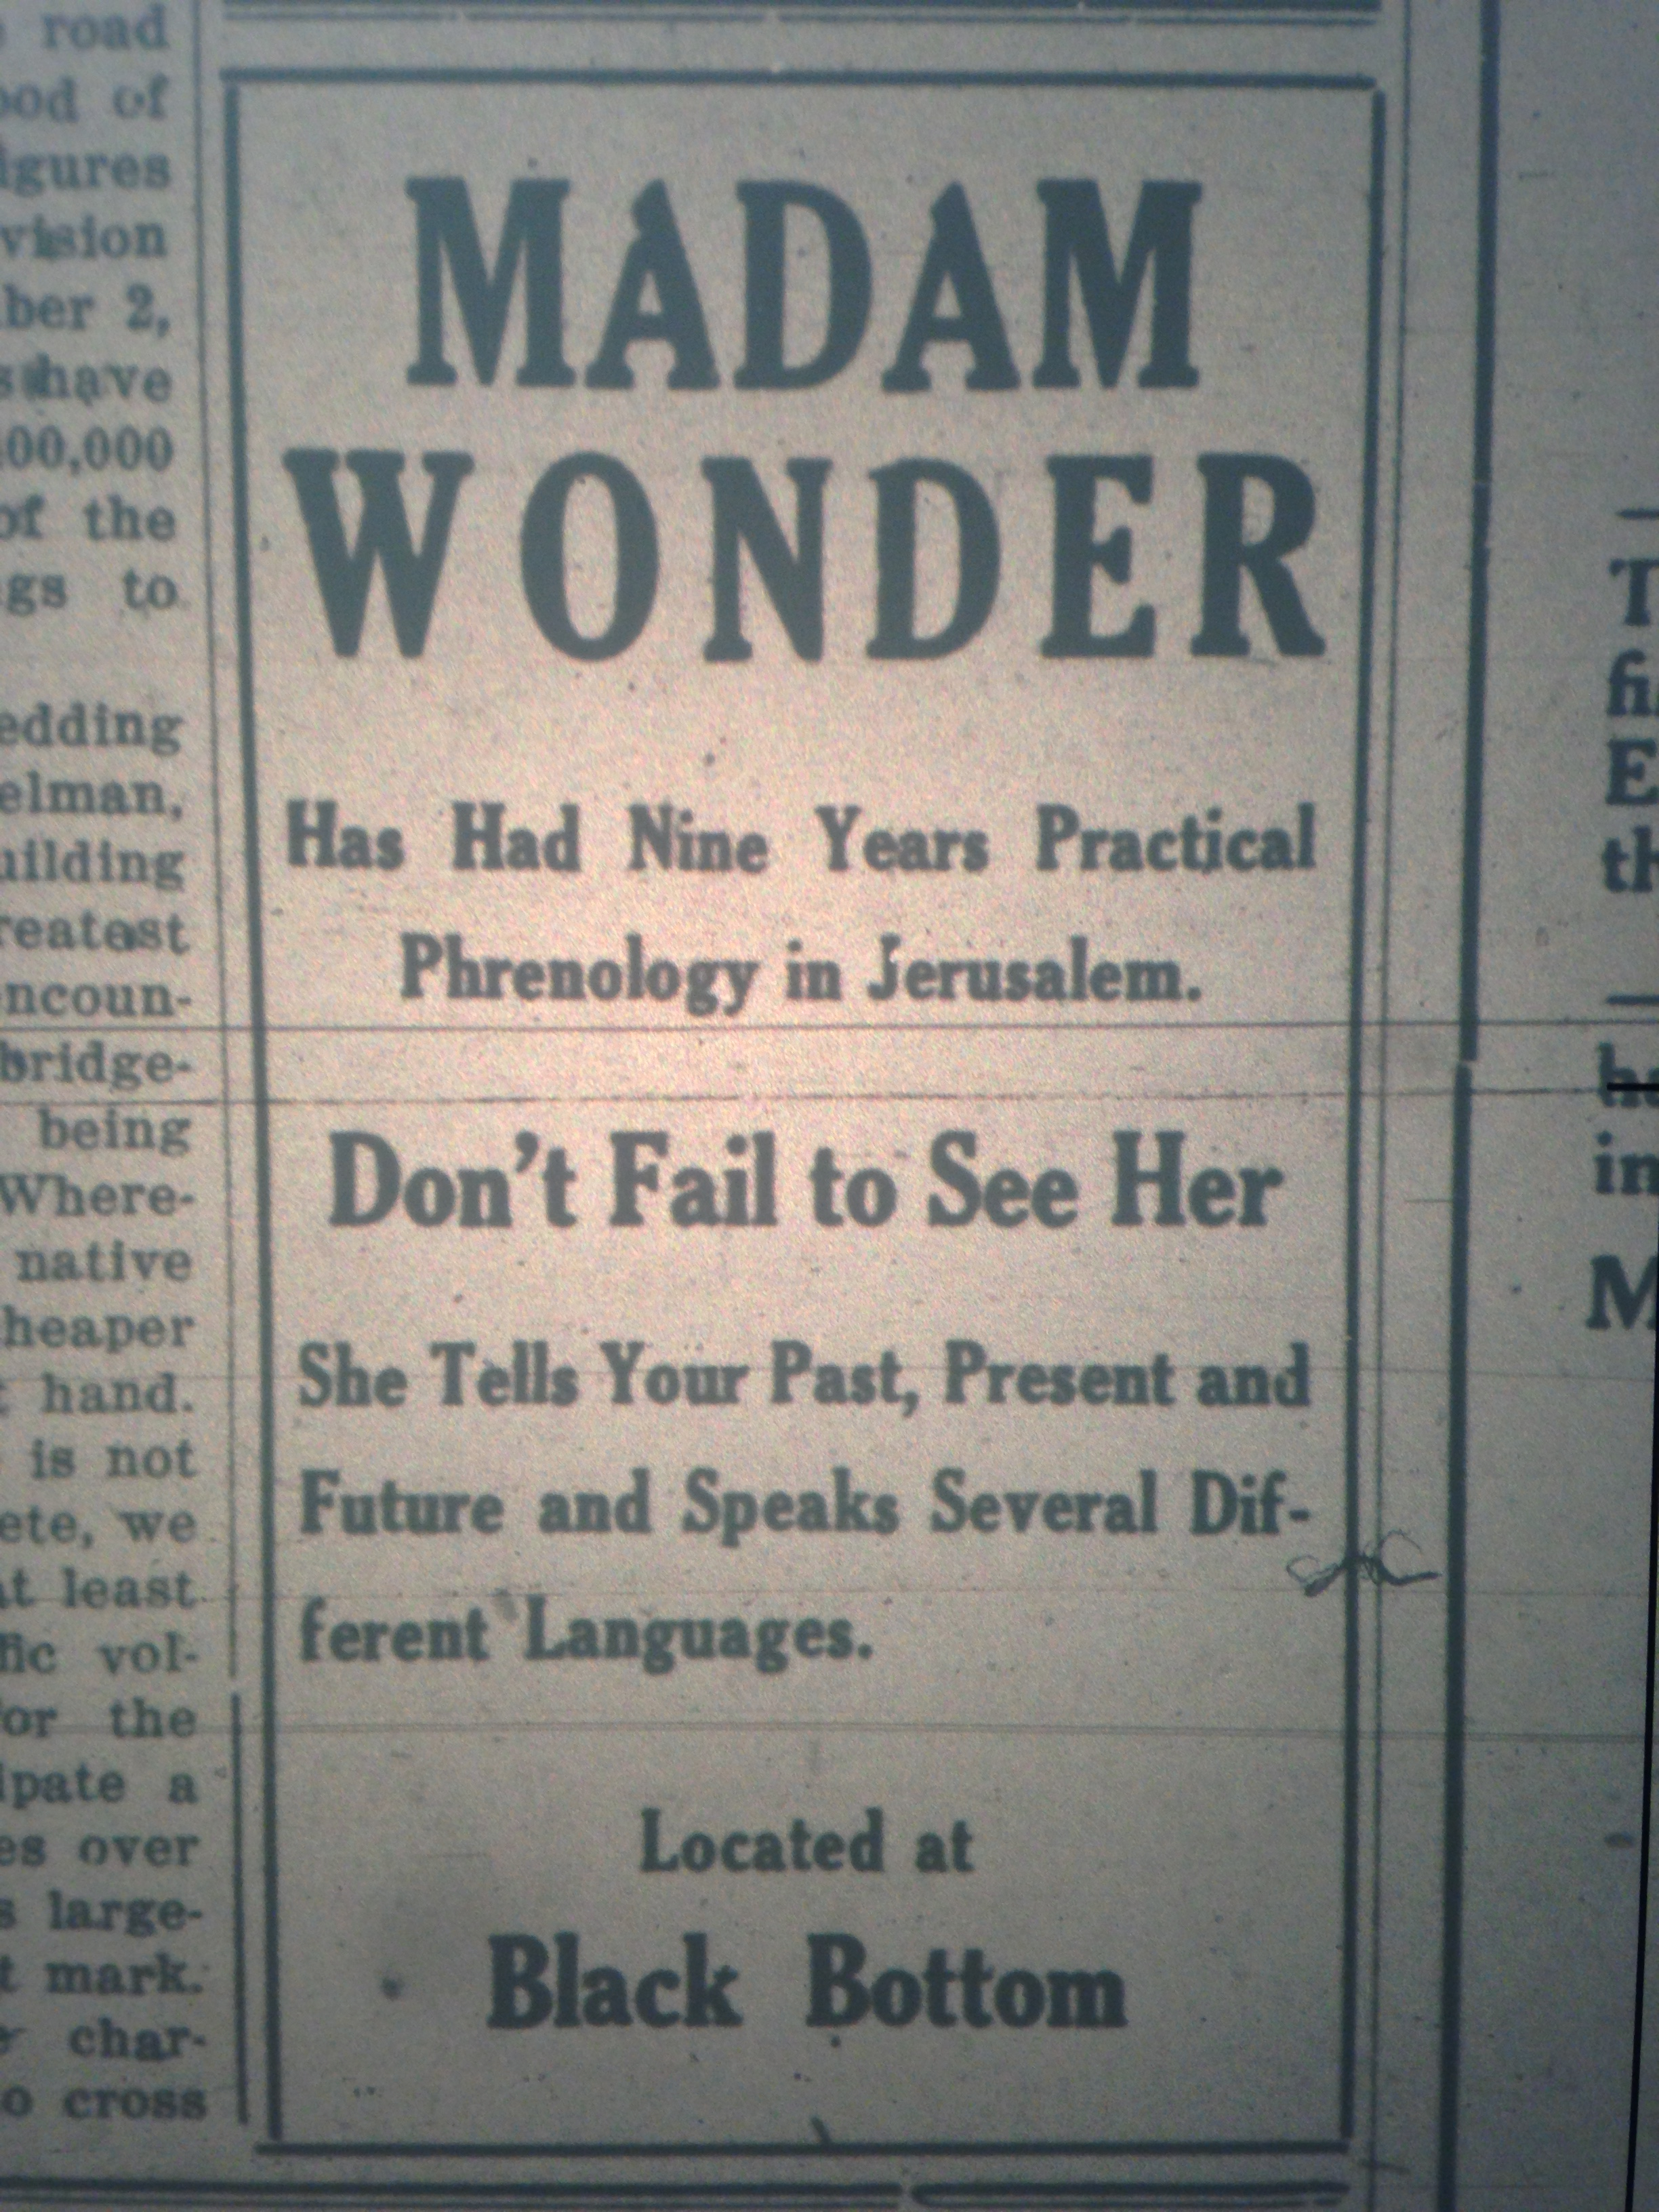 Madam Wonder Ad LB 10.25.1927.JPG